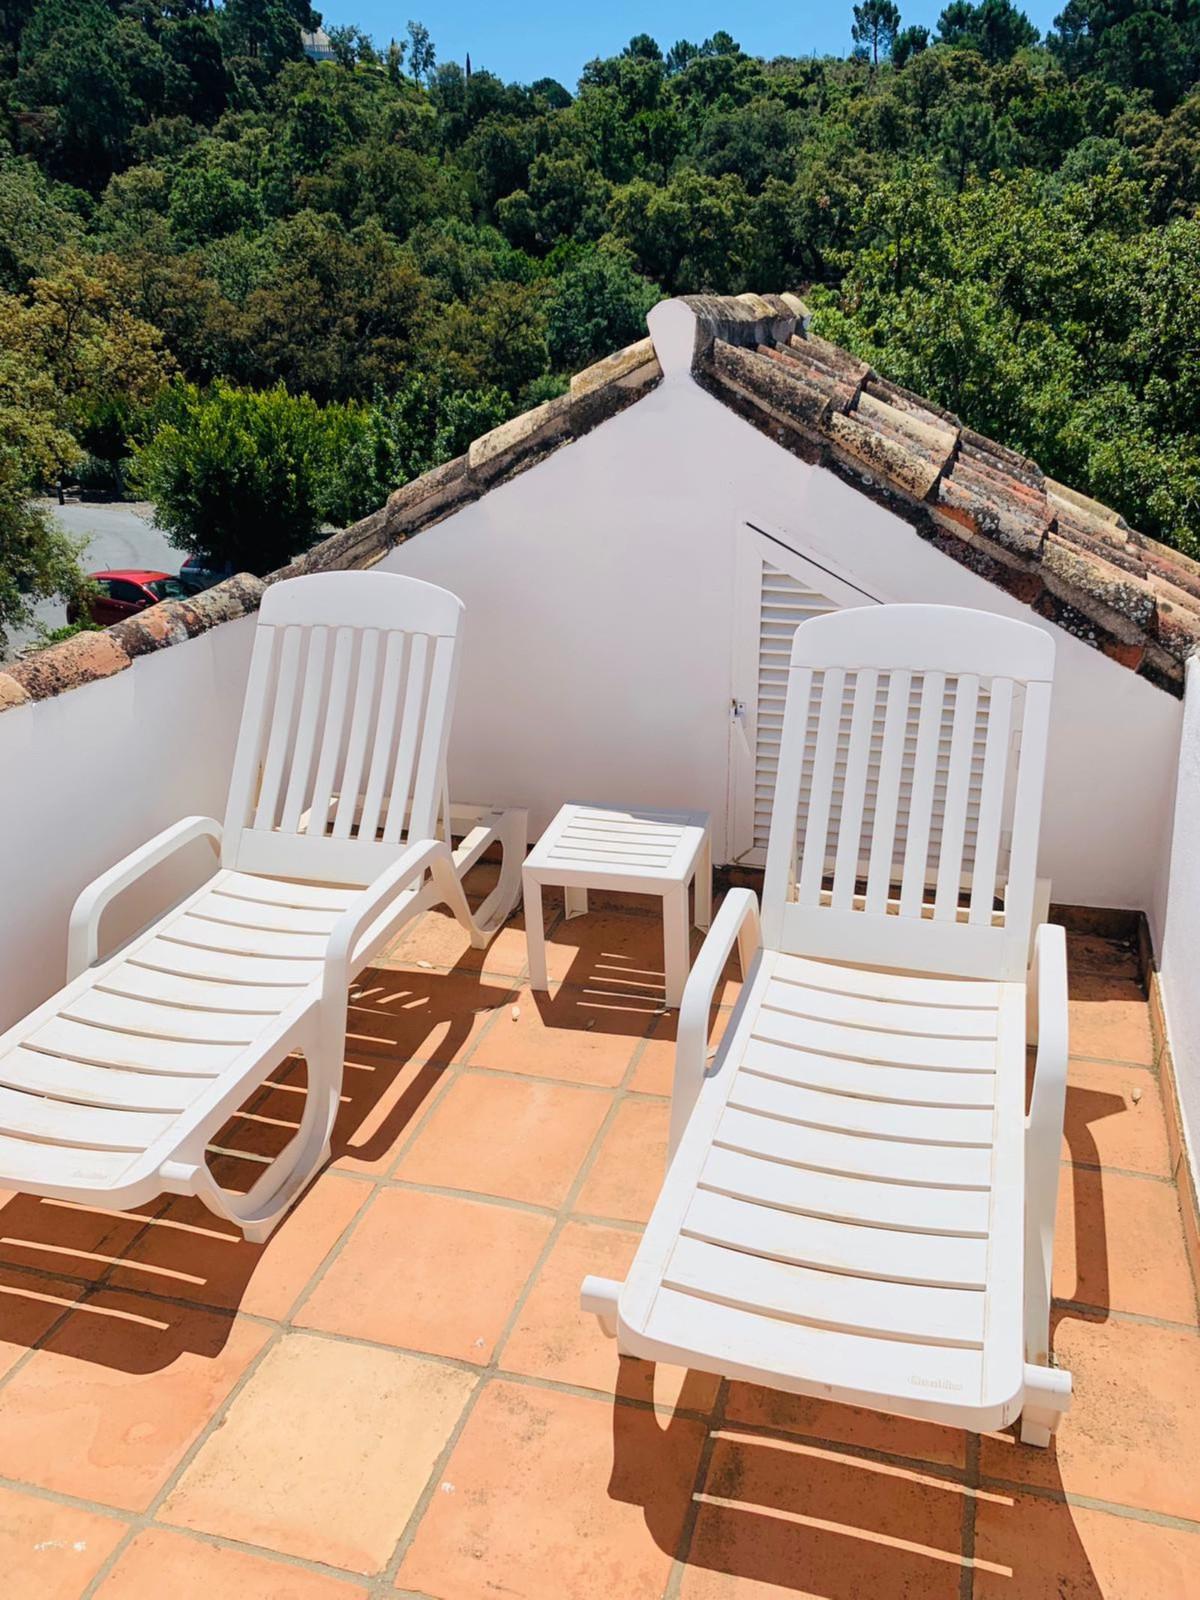 2 Bedroom Villa For Sale - La Zagaleta, Benahavis